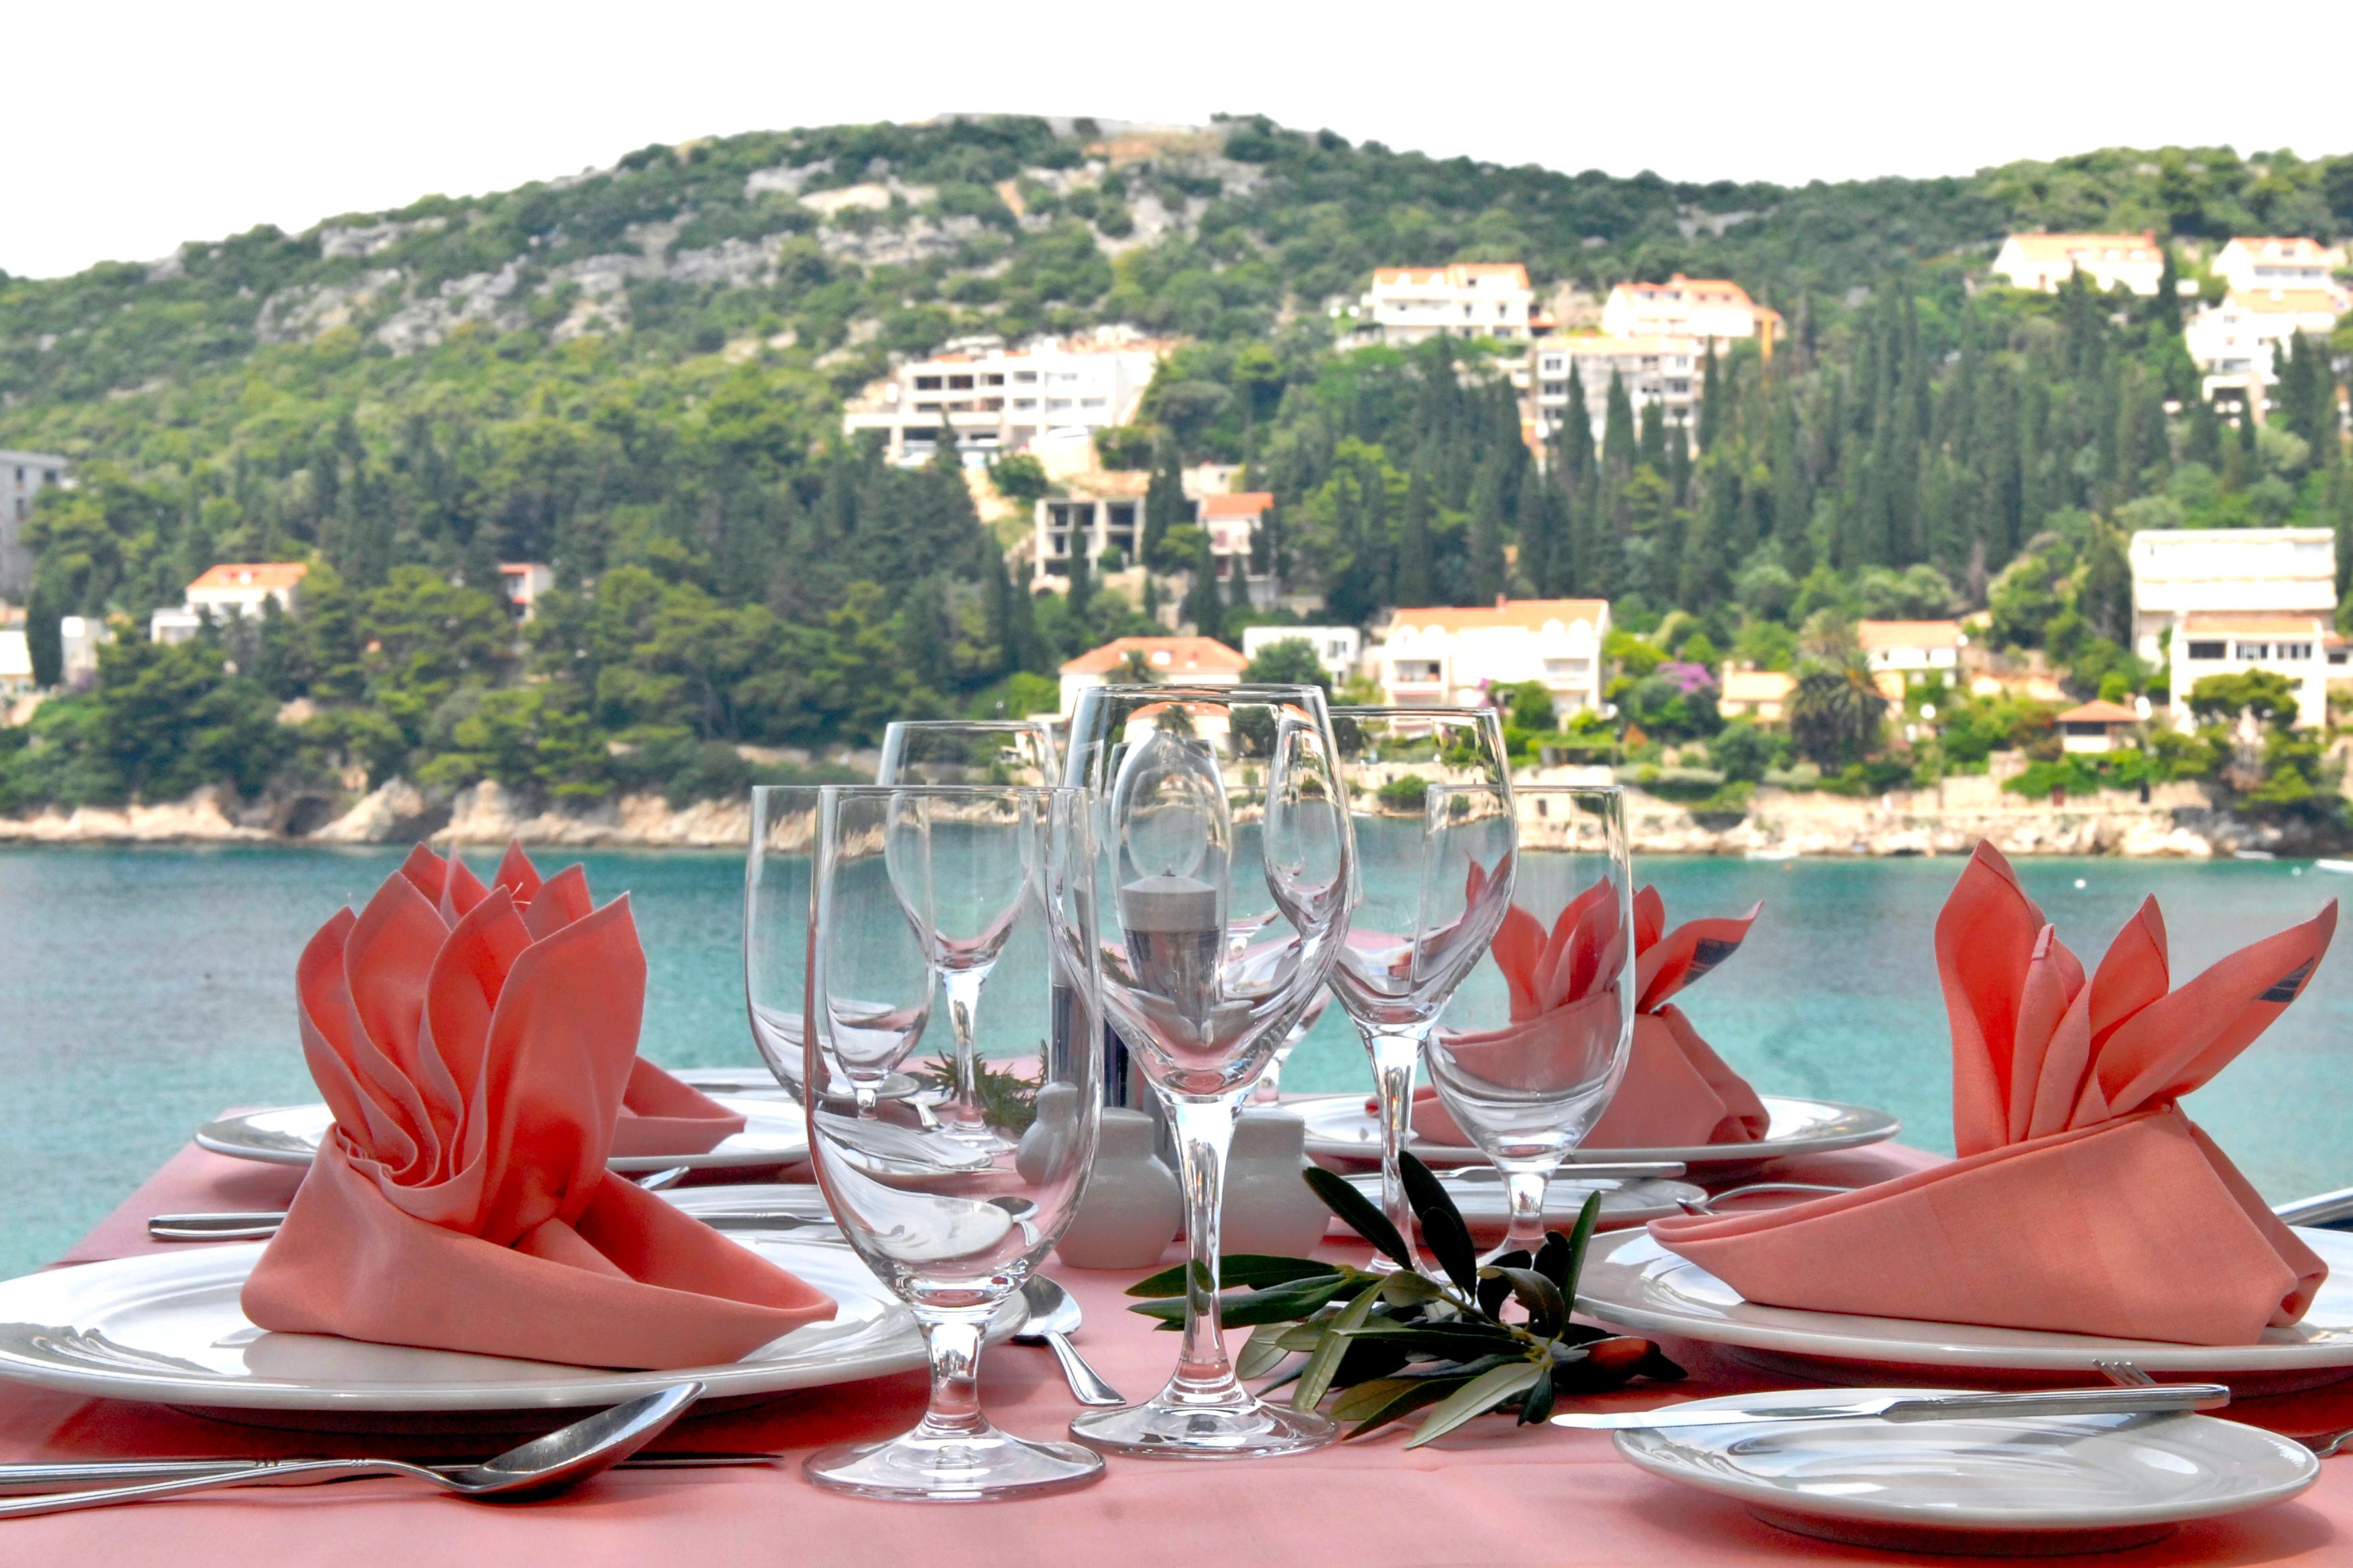 vis-hotel-restaurant-table-setup